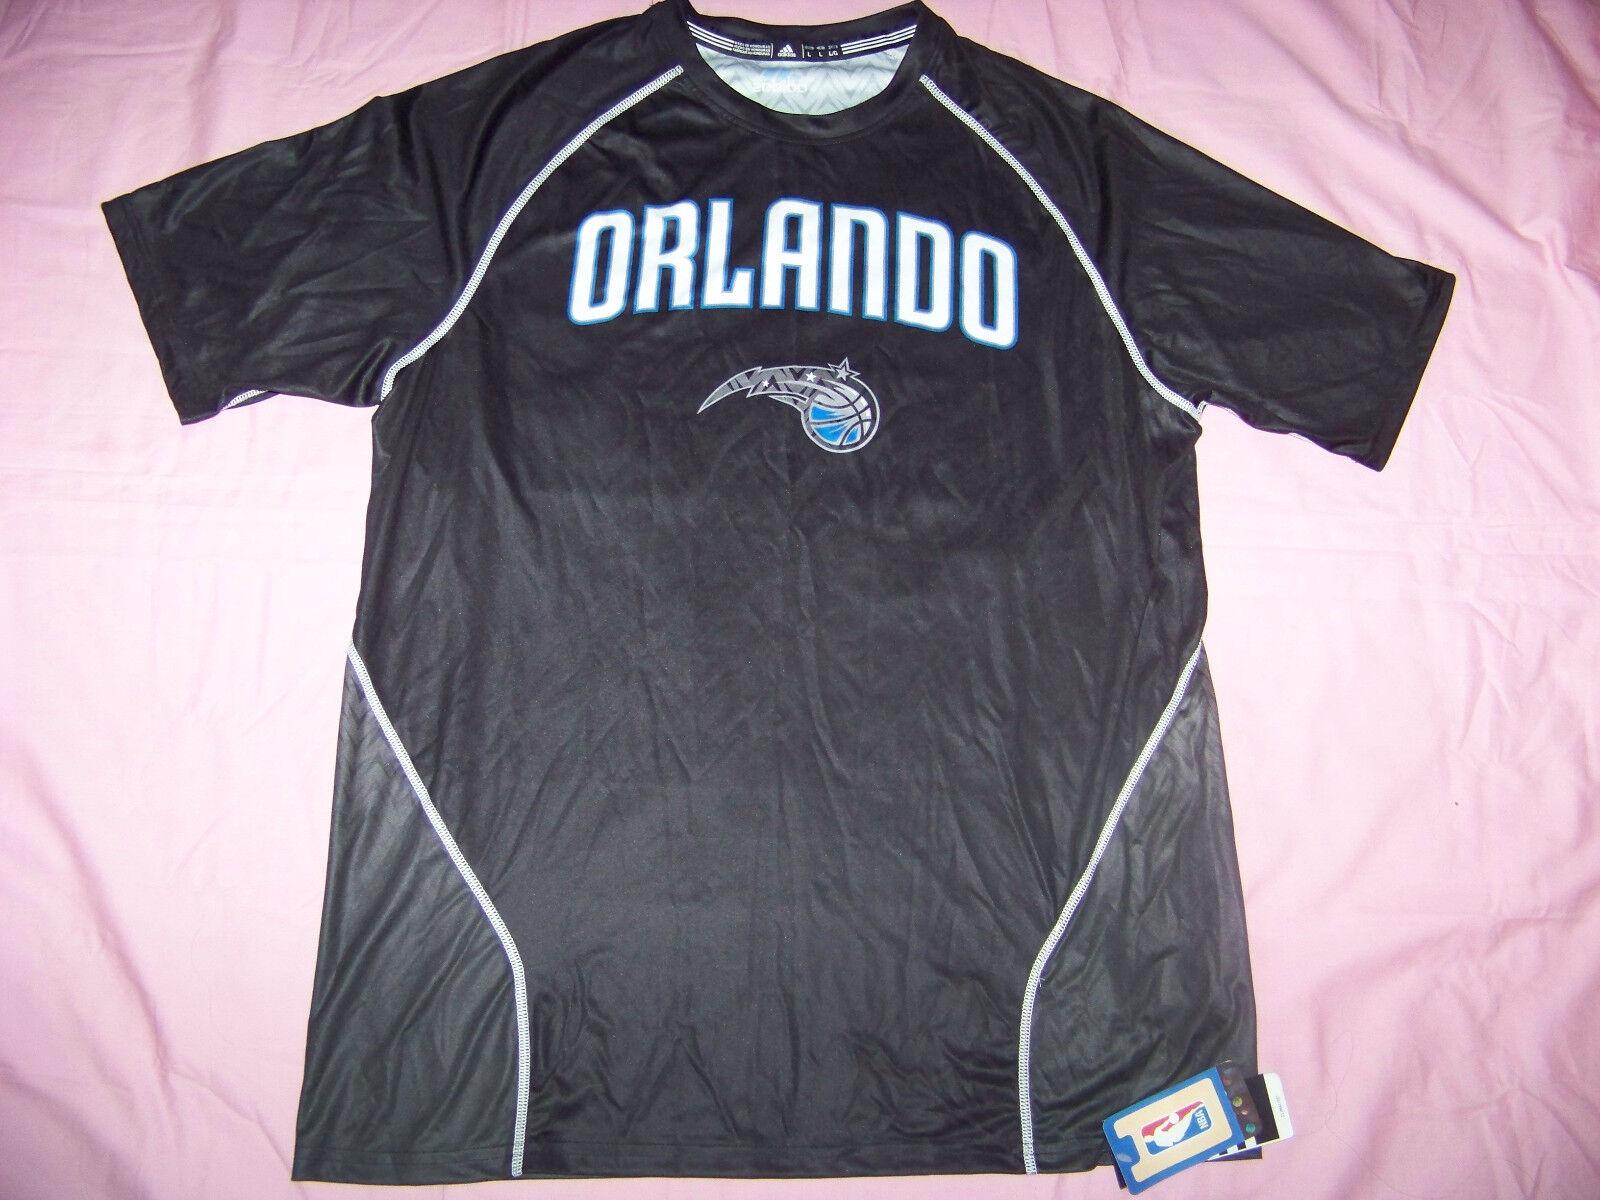 Adidas ClimaLite Men's Resonate Tee Orlando Magic Shirt NWT Large